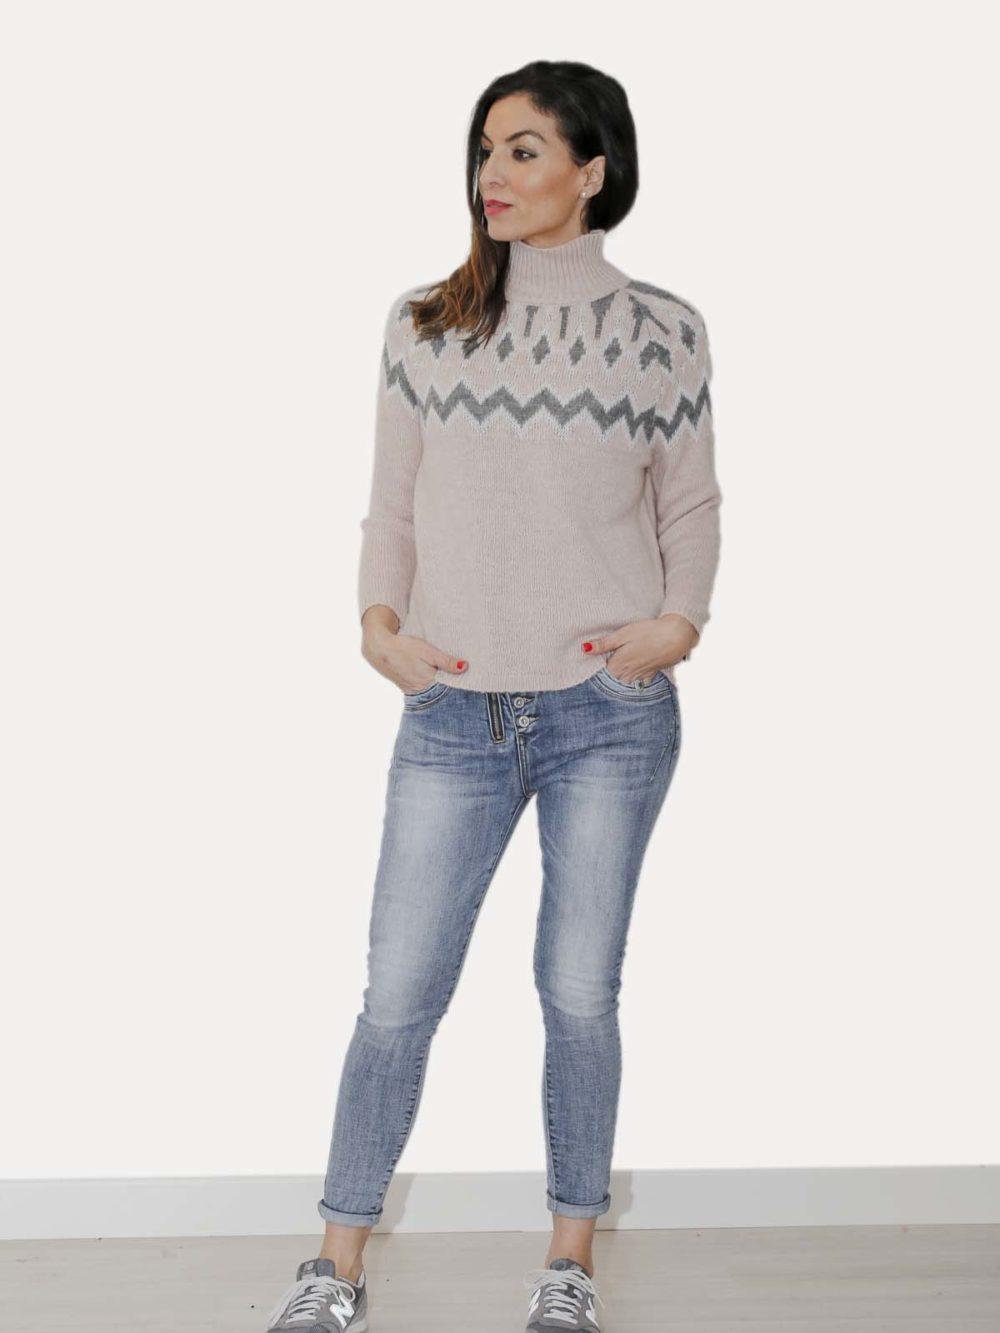 Scandi 'jeans'